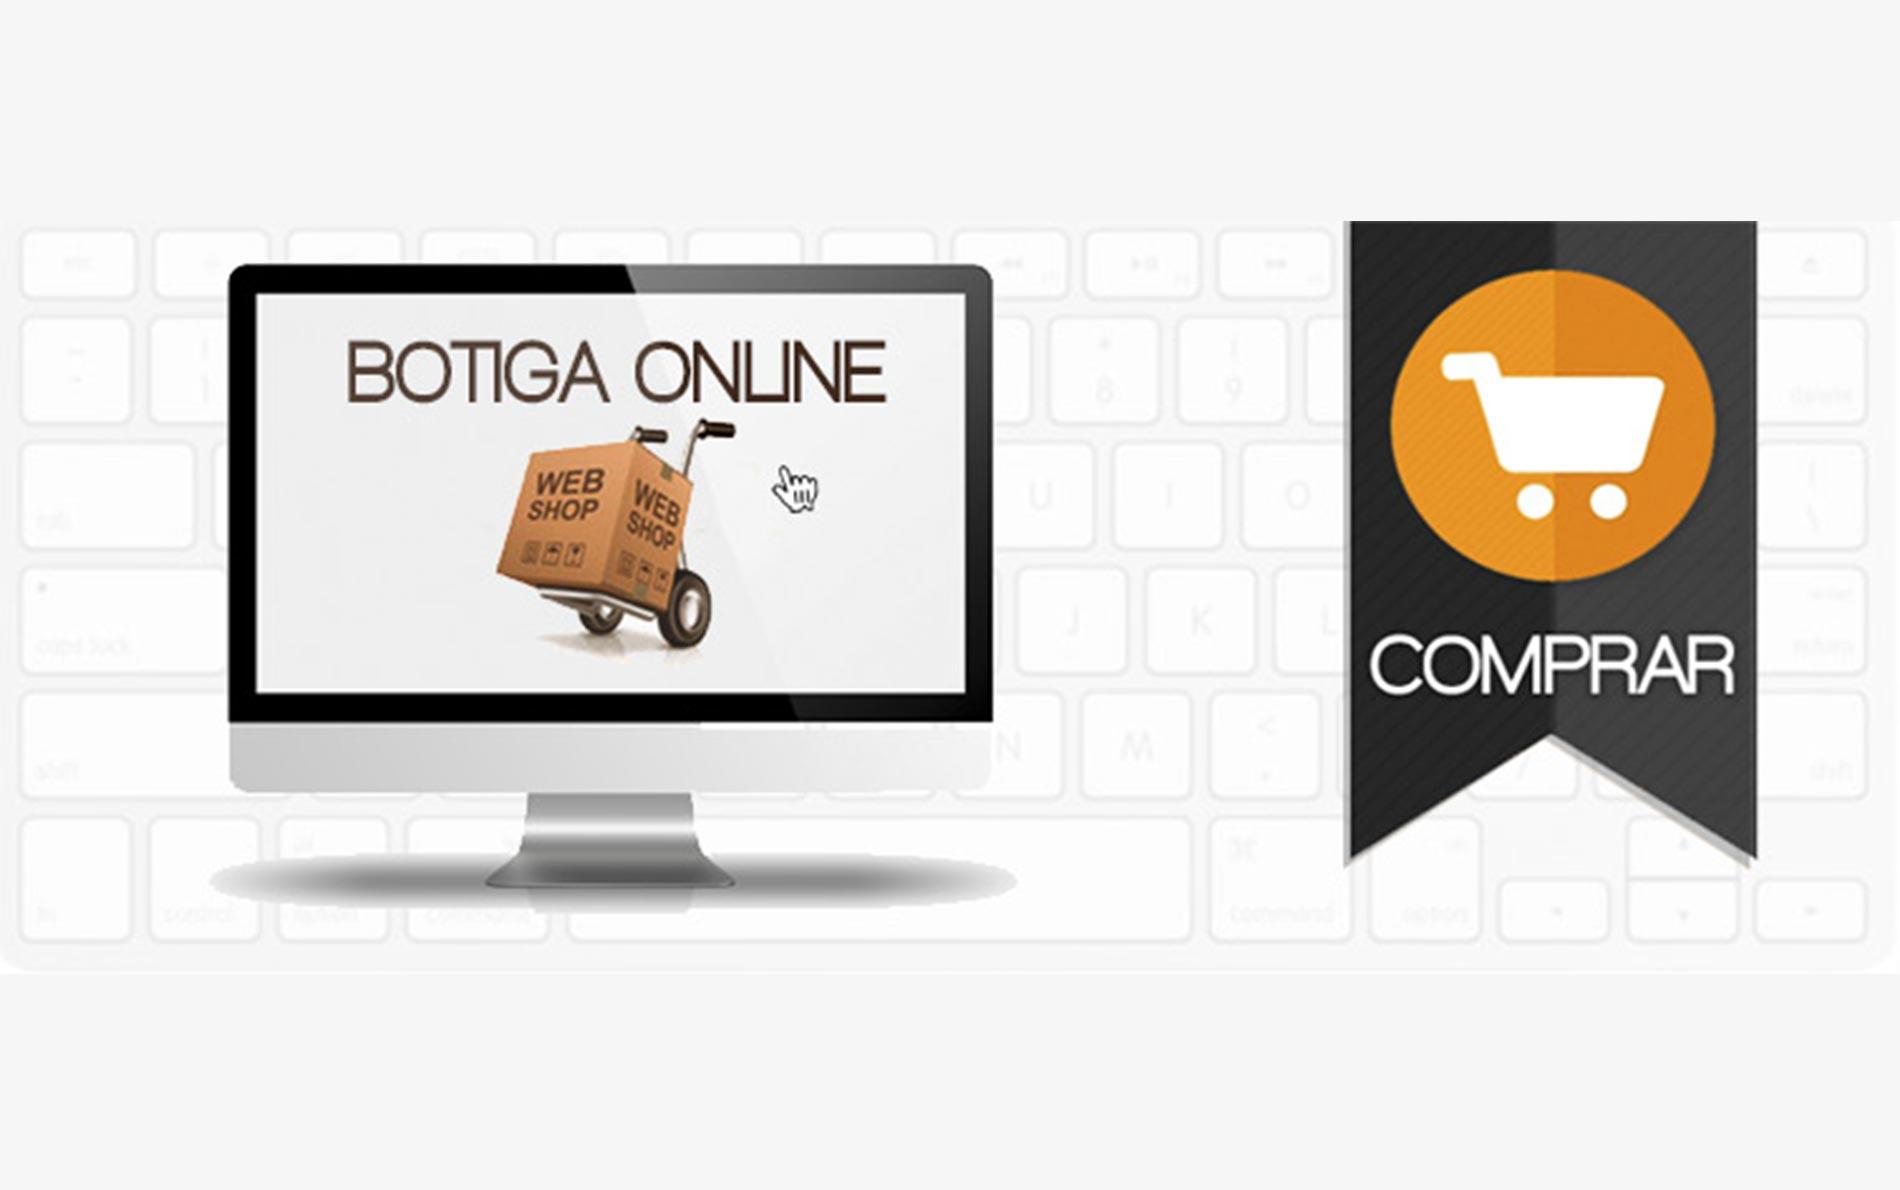 Ismoble botiga online